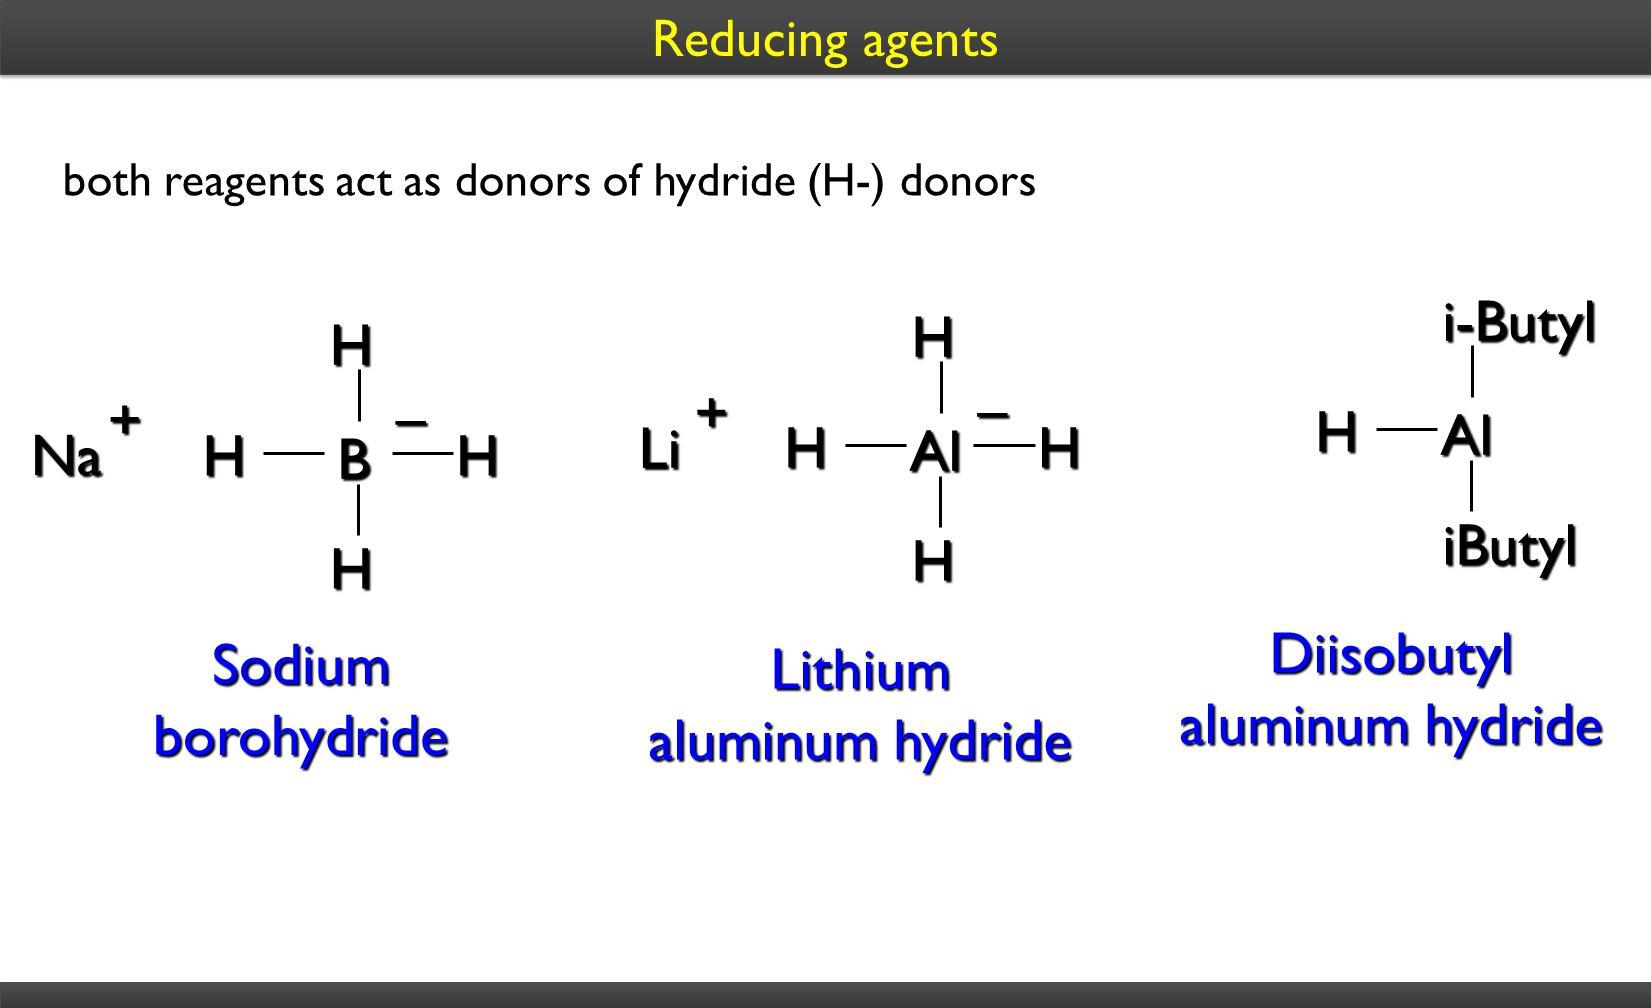 Sodium borohydride Na + – B HHHH Lithium aluminum hydride Li + – Al HHHH both reagents act as donors of hydride (H-) donors Diisobutyl aluminum hydrid